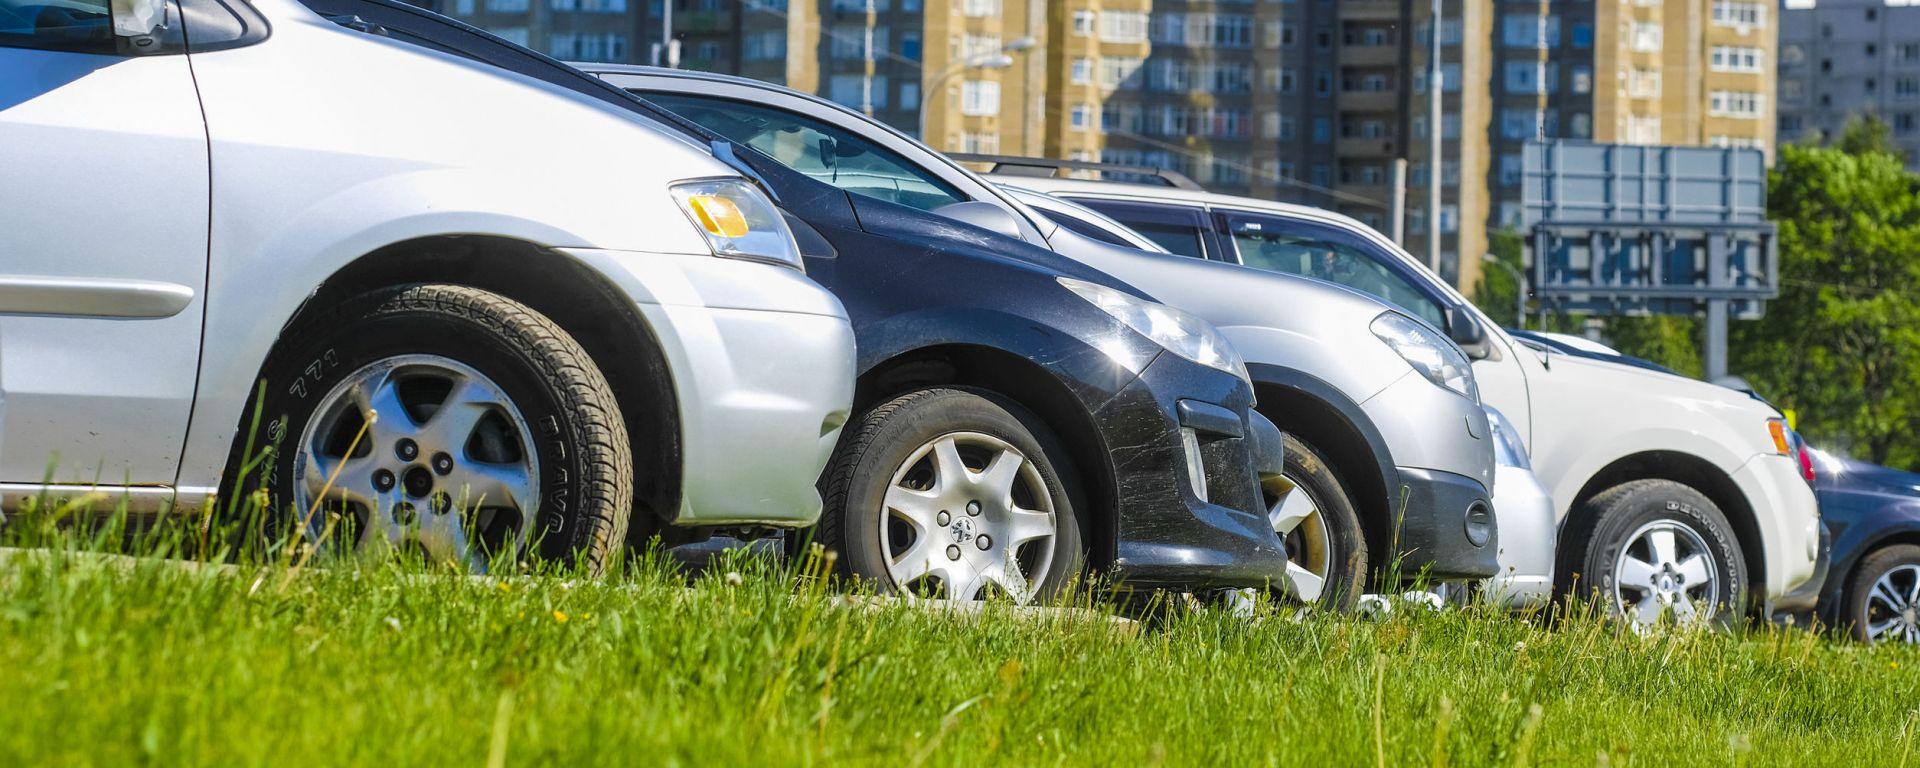 Incentivi auto: rinnovo agli Ecobonus 2021?